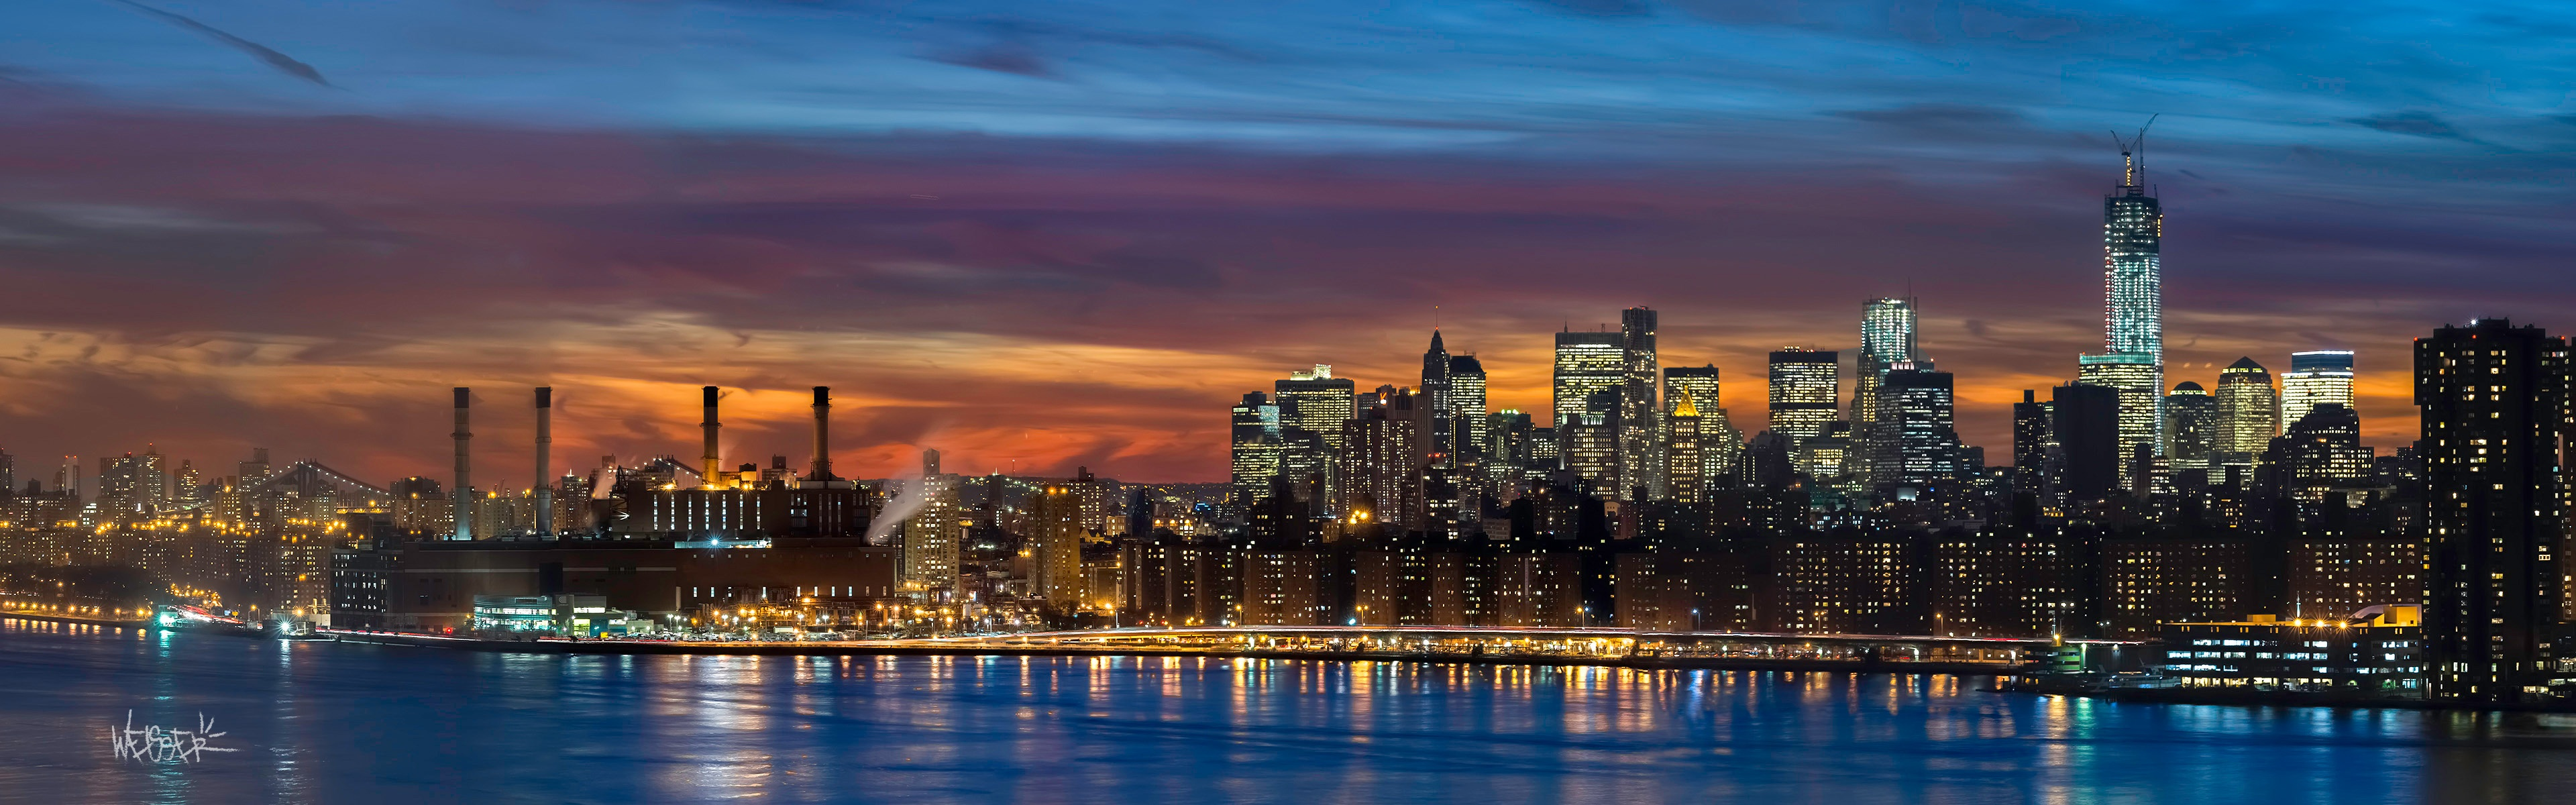 _downloadfiles_wallpapers_3840_1200_manhattan_skyline_new_york_panorama_16672.jpg